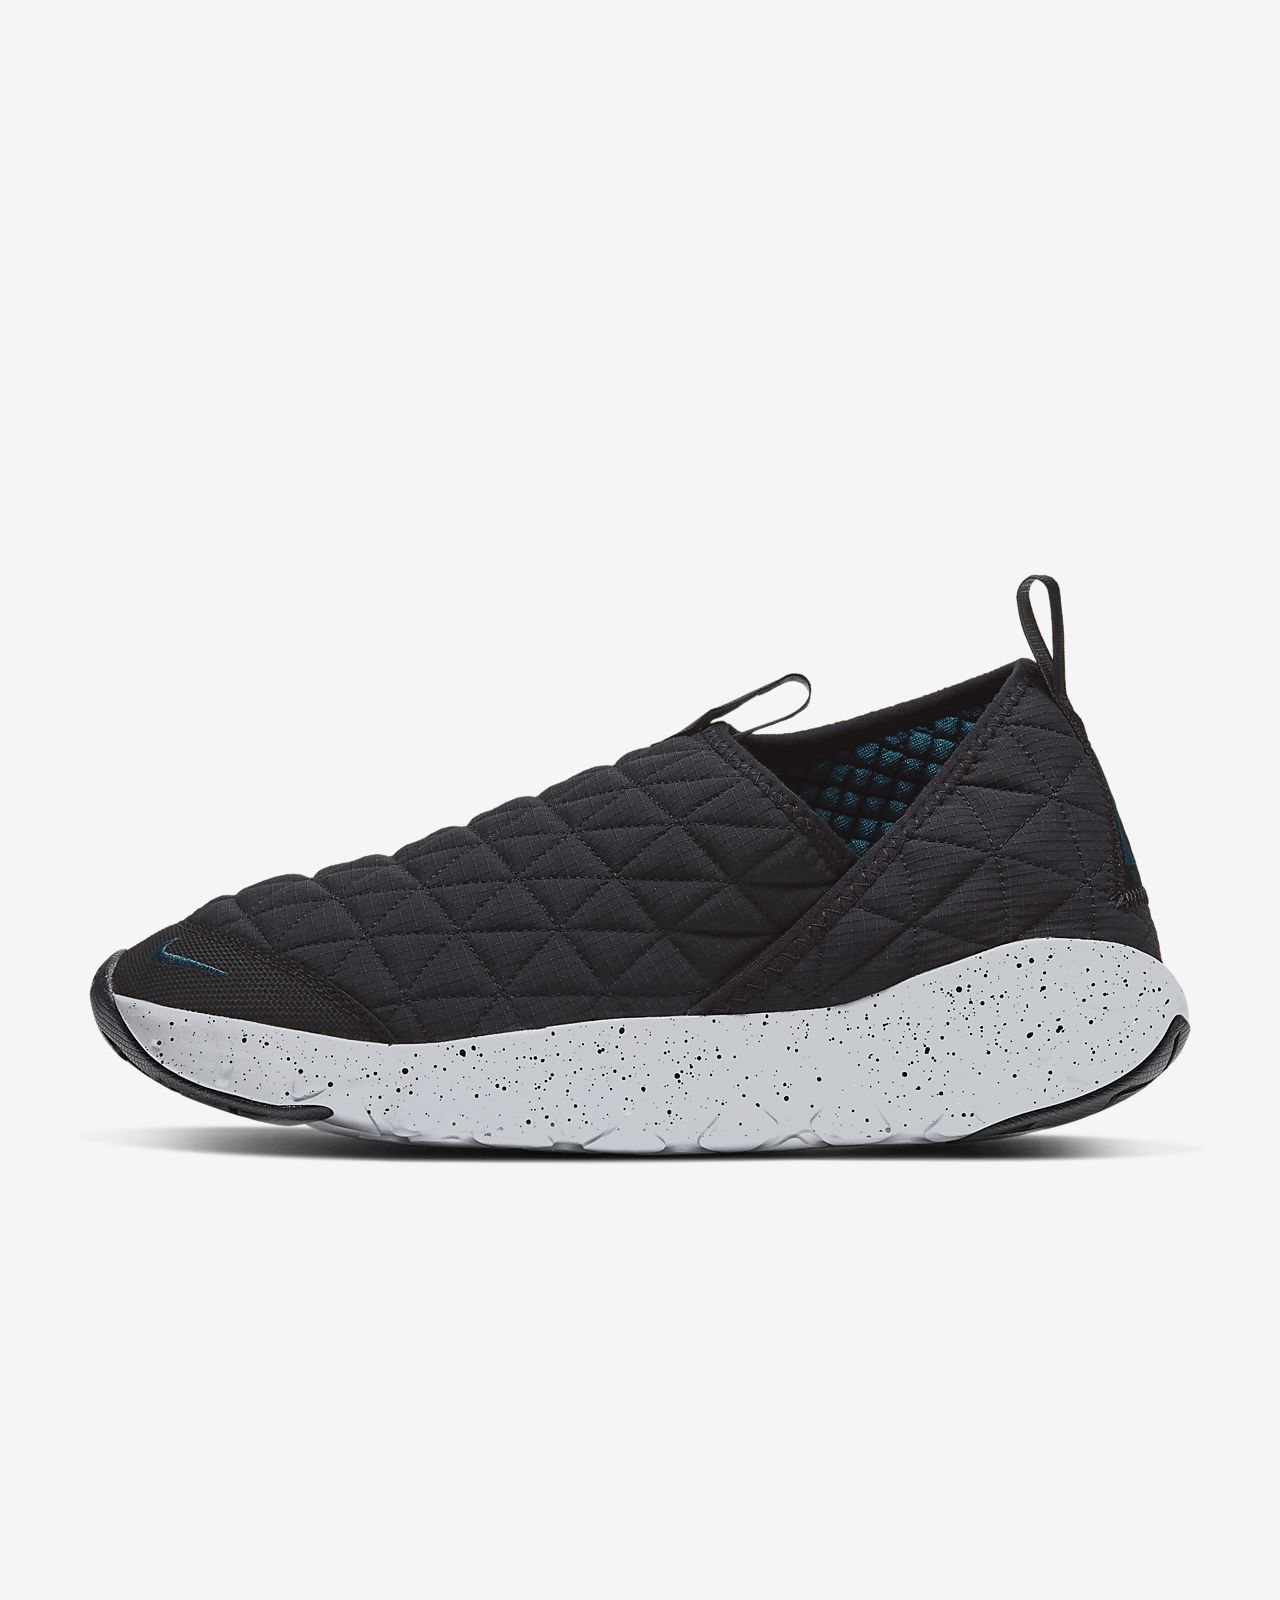 Buty Nike ACG MOC 3.0